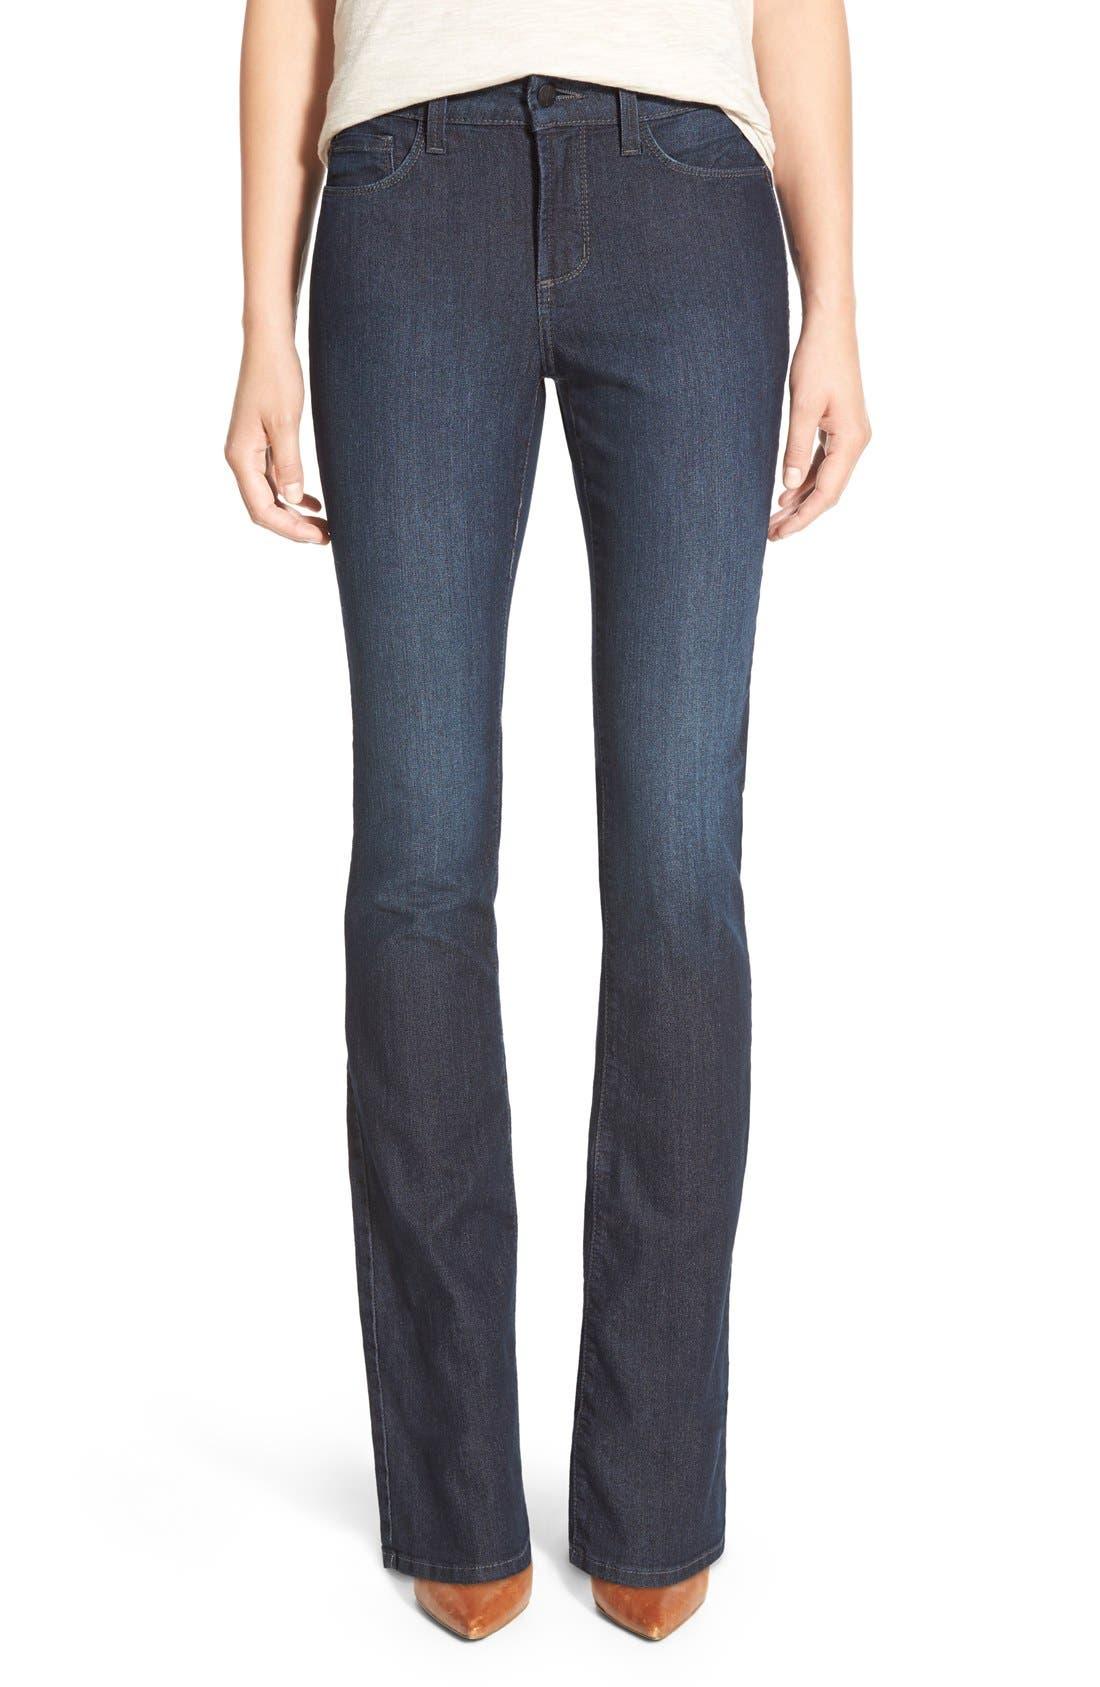 'Billie' Stretch Mini Bootcut Jeans,                             Main thumbnail 1, color,